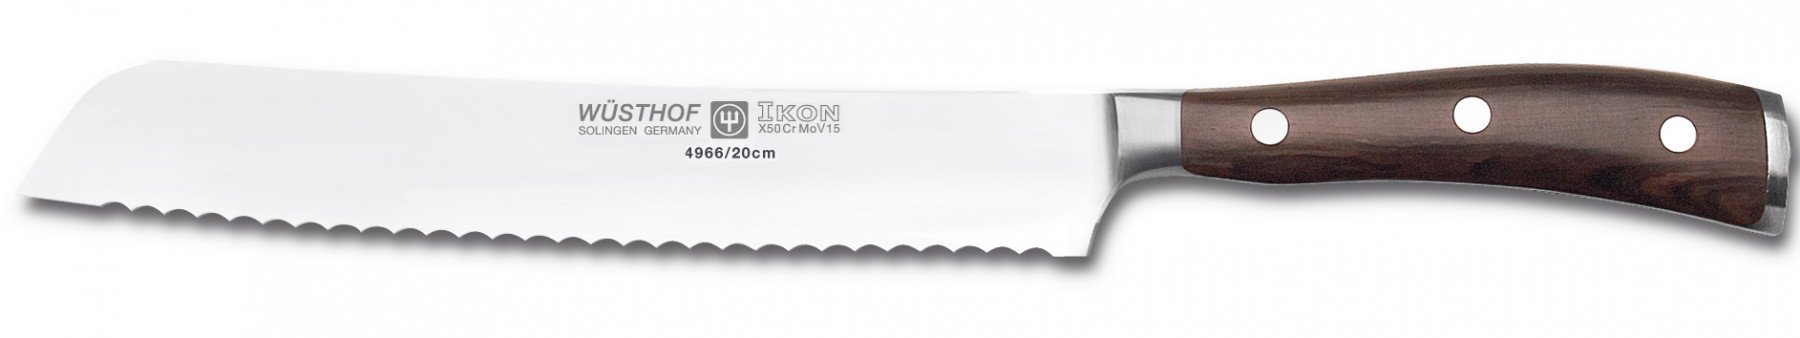 Wüsthof Dreizack Ikon Brotmesser 20cm